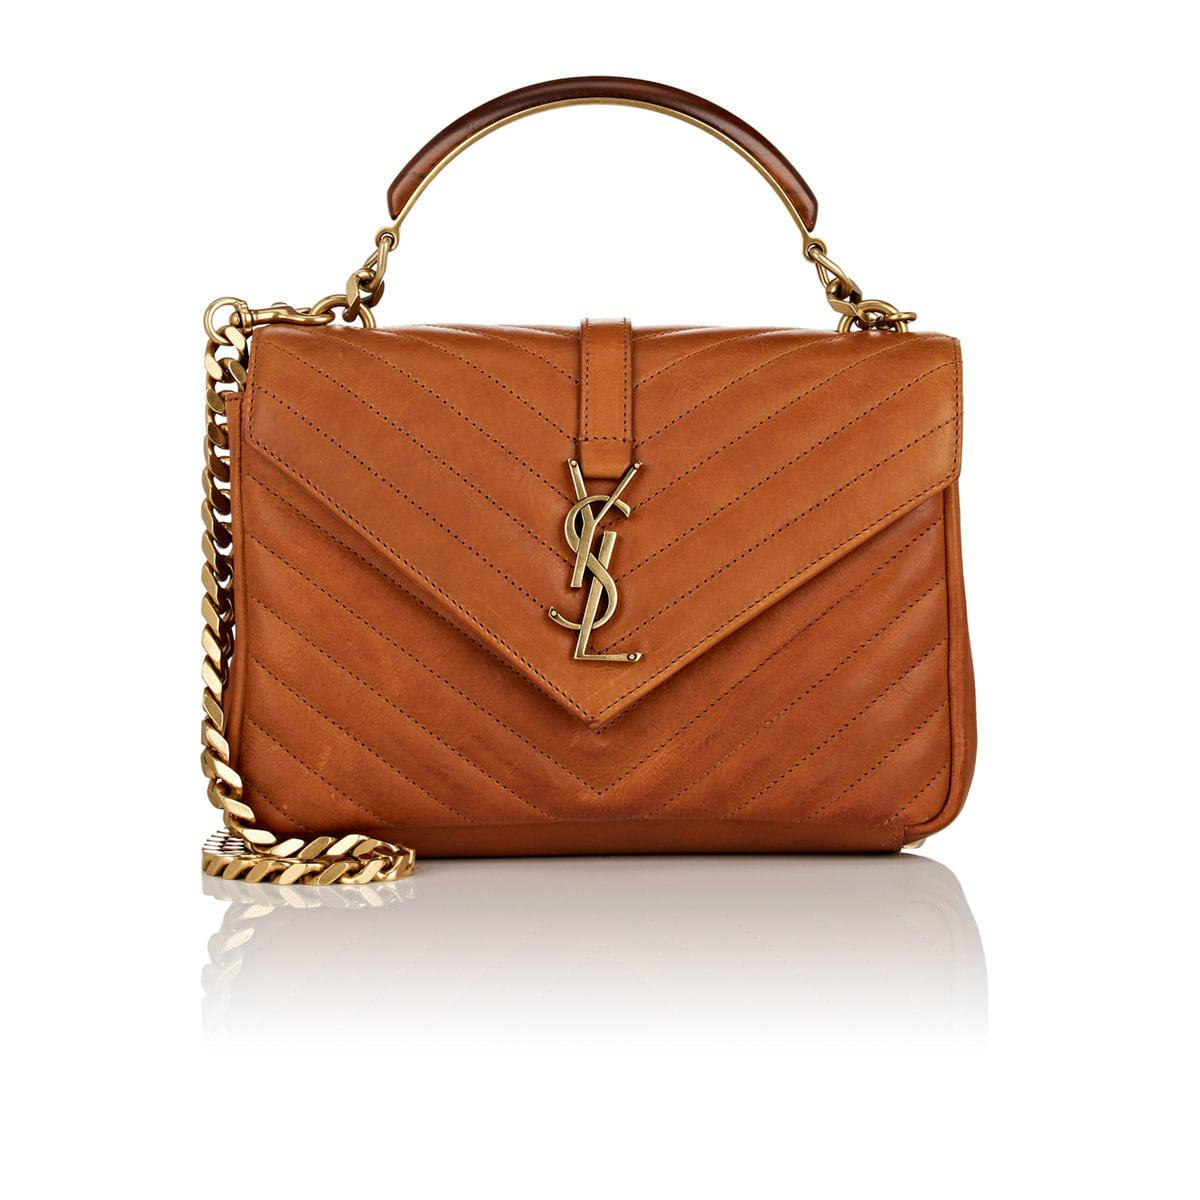 48cbc28a1ca Saint Laurent Monogram College Medium Leather Shoulder Bag in Brown ...